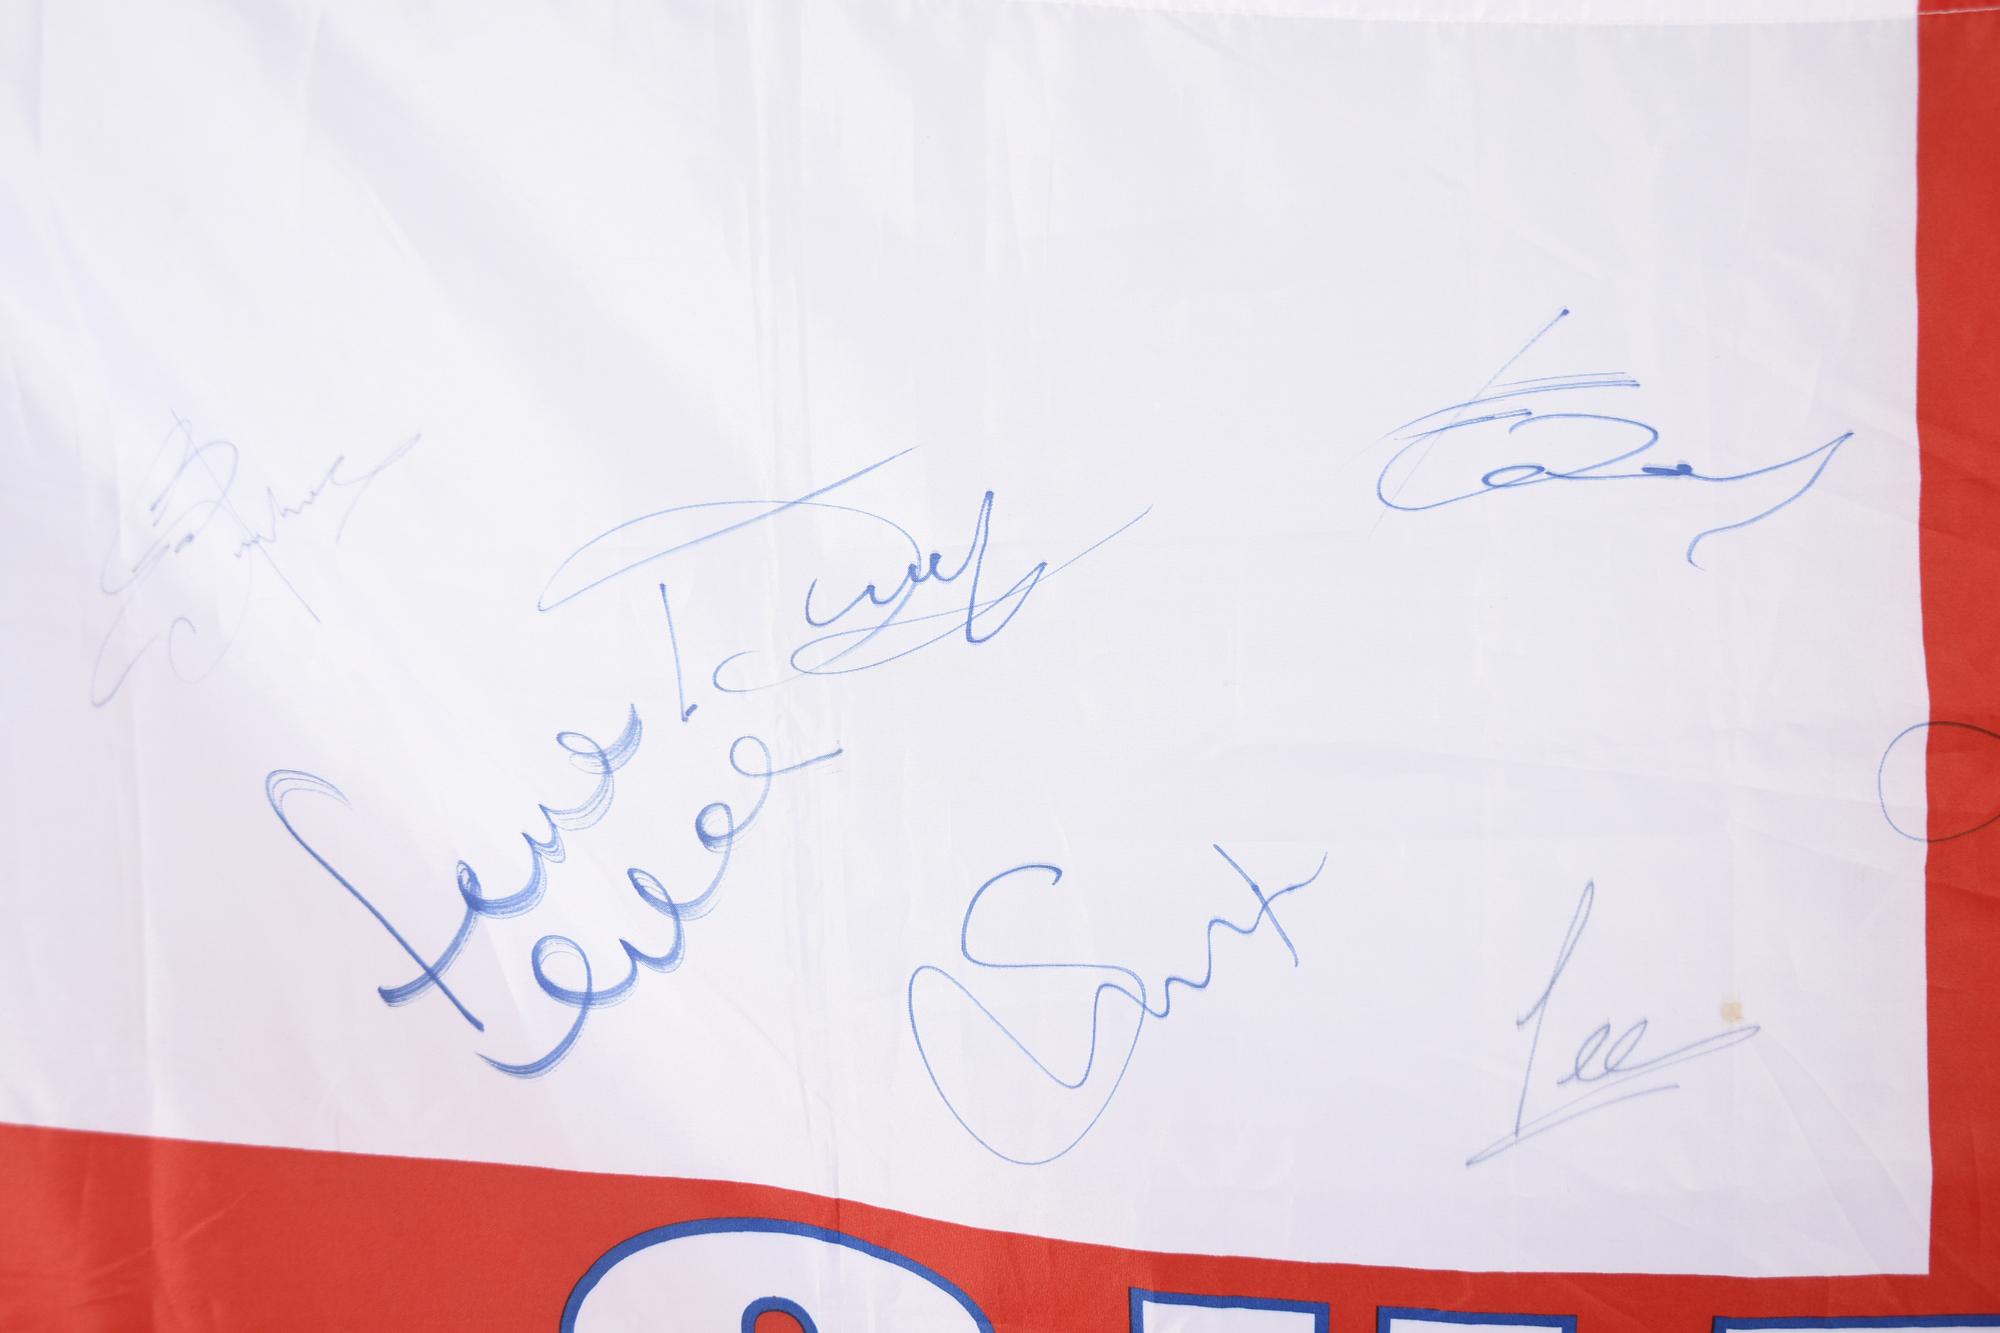 CHELSEA STARS & SIGNED FLAG Original Signature - Image 8 of 11